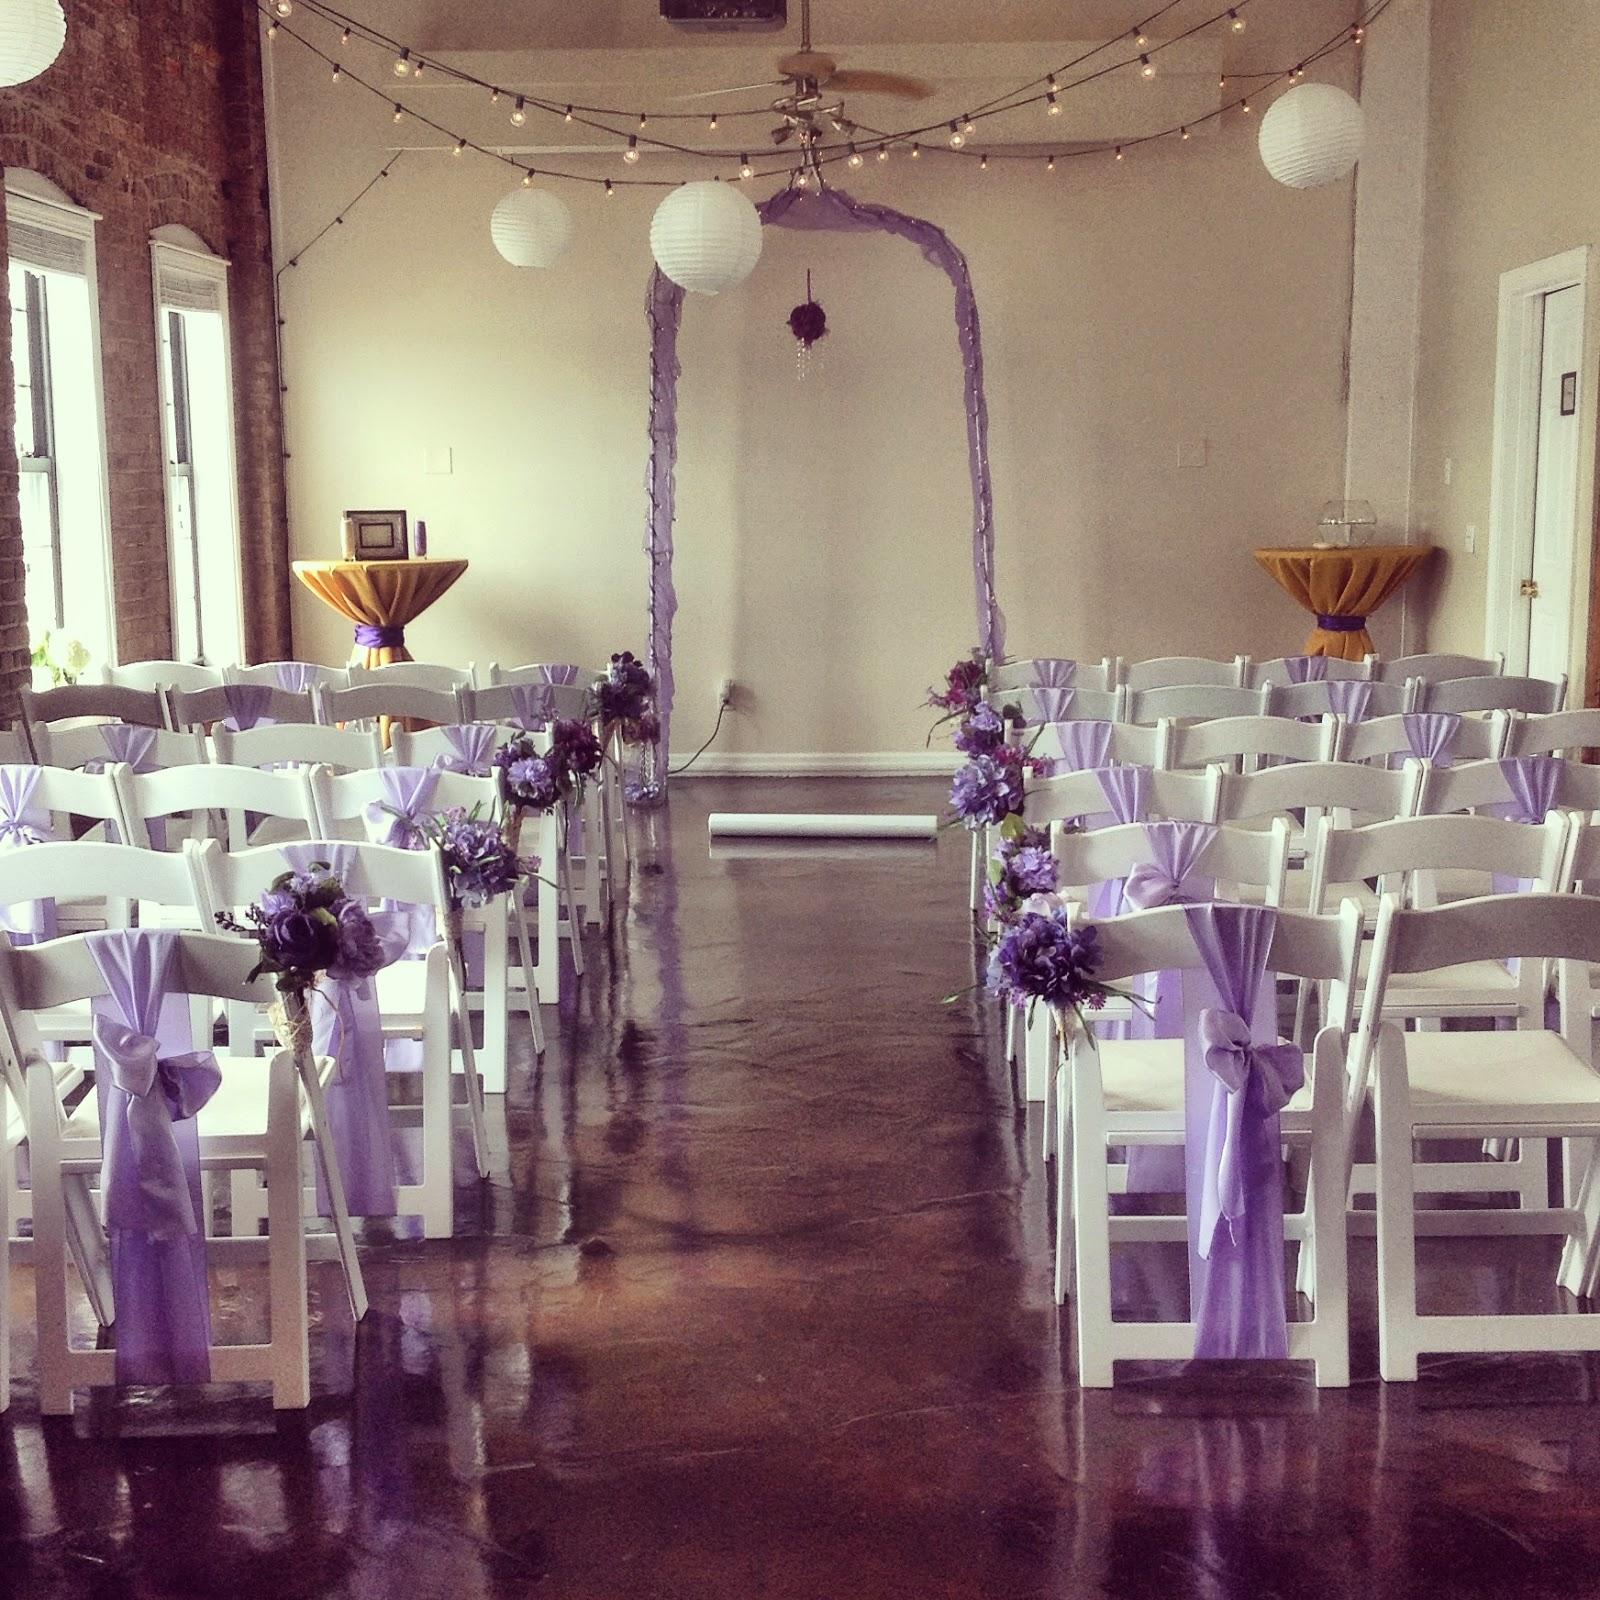 Ceremony And Reception In Same Room: Lindsey & Carl Indoor Wedding Ceremony & Reception